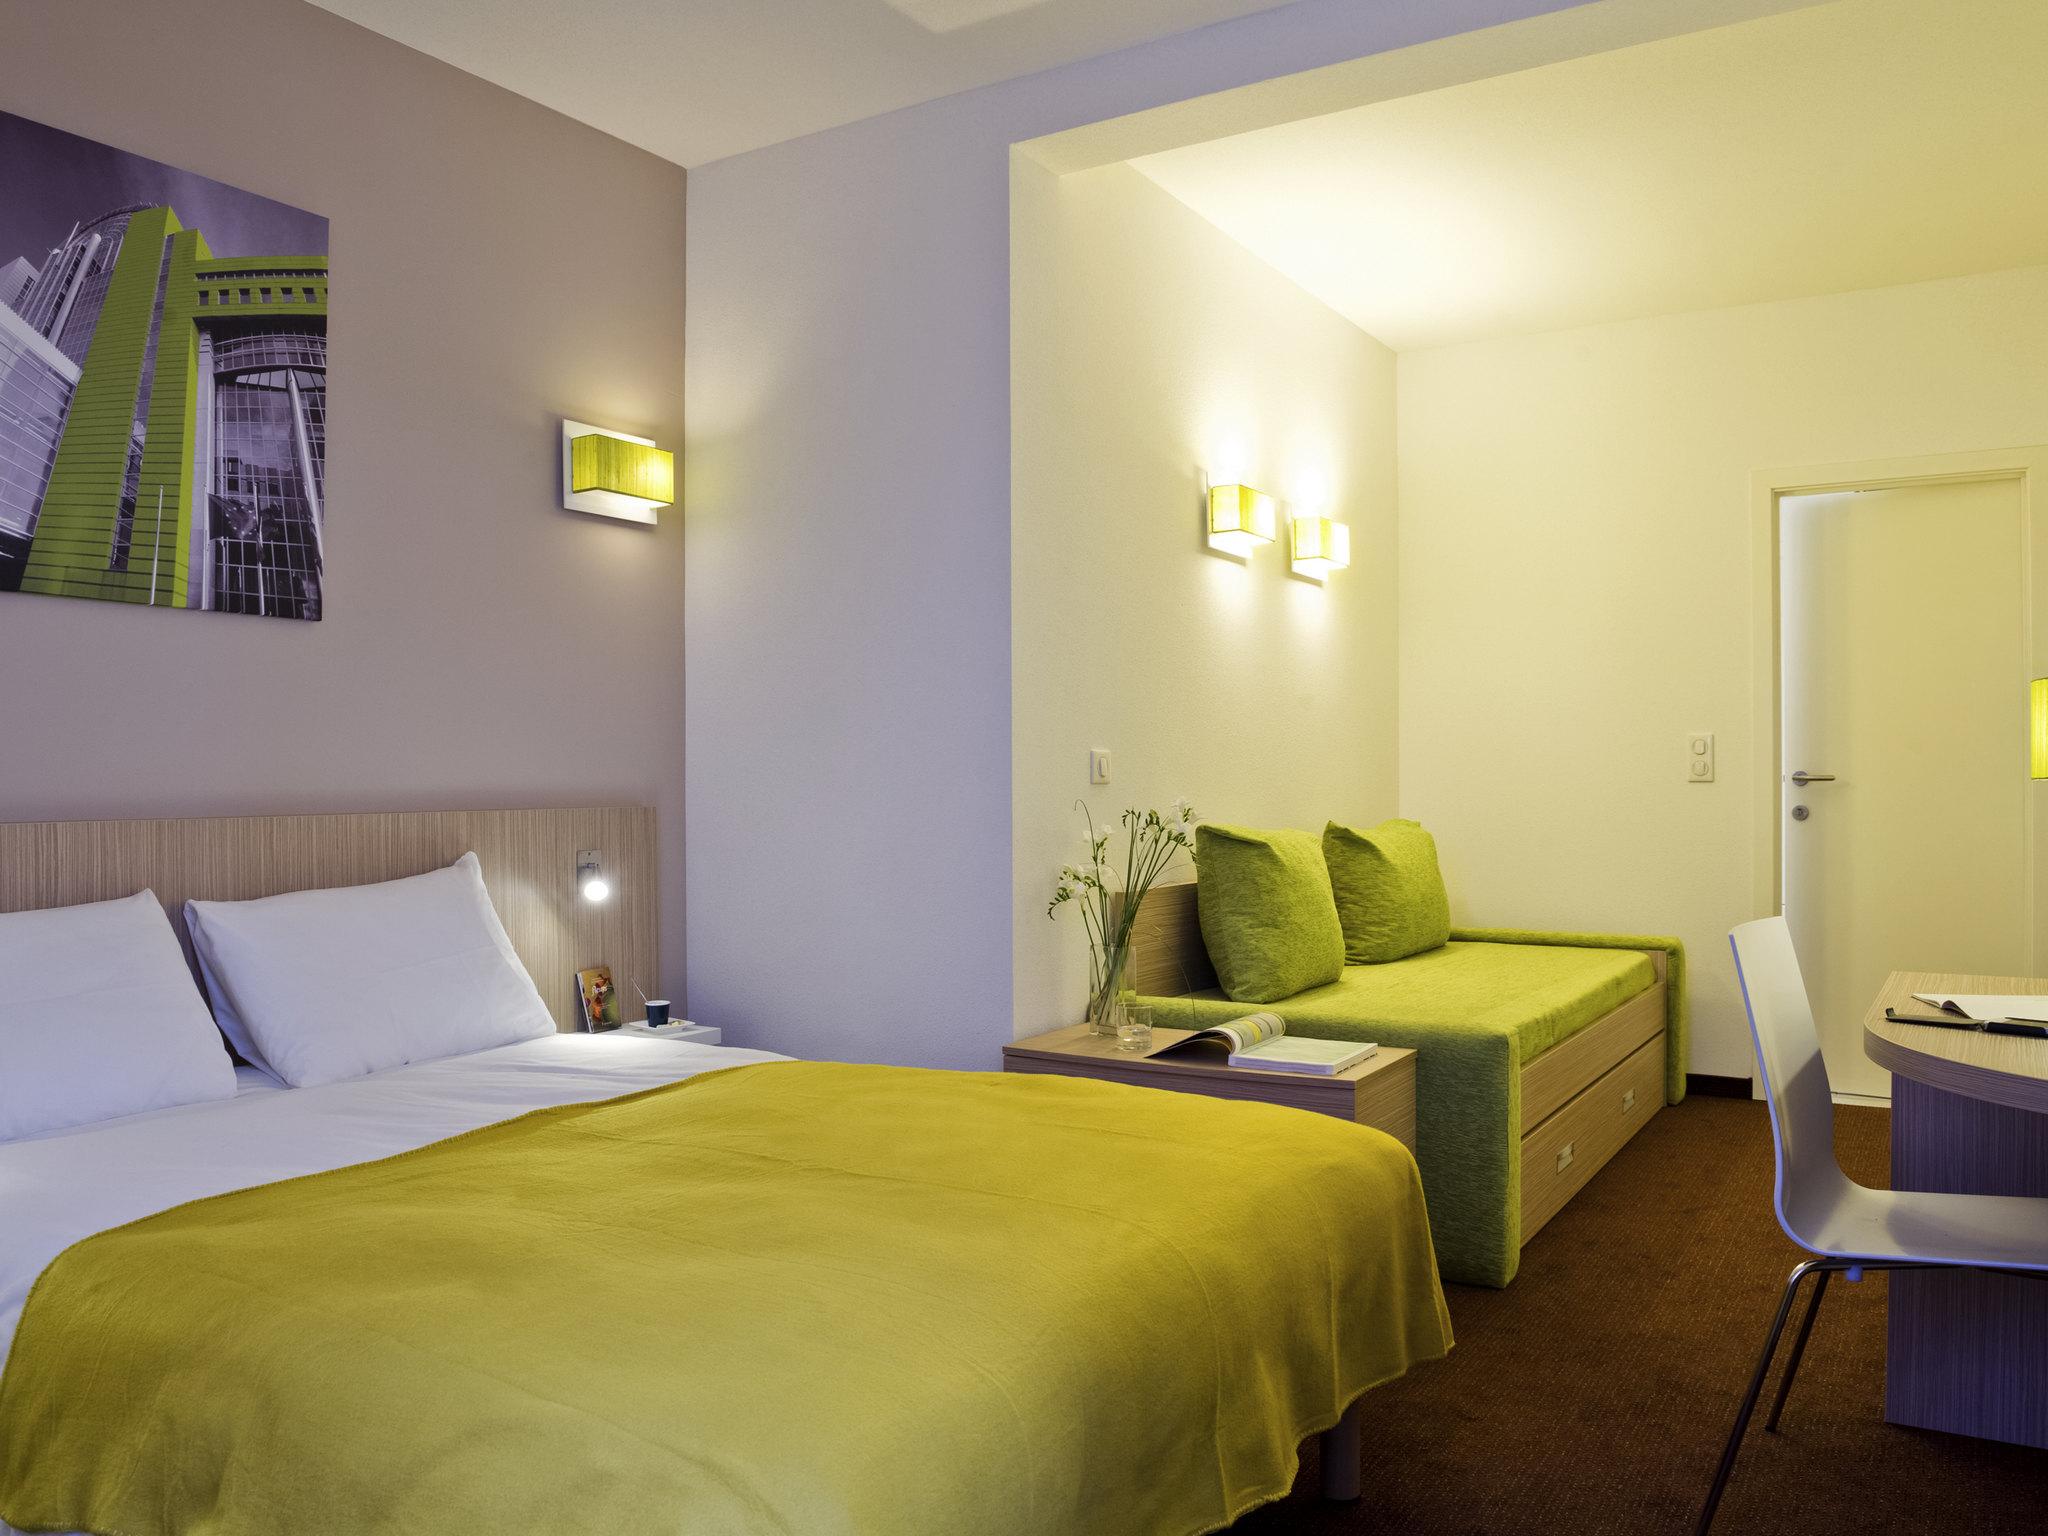 فندق - أداجيو أكسس Aparthotel Adagio Access براسلز يوروب